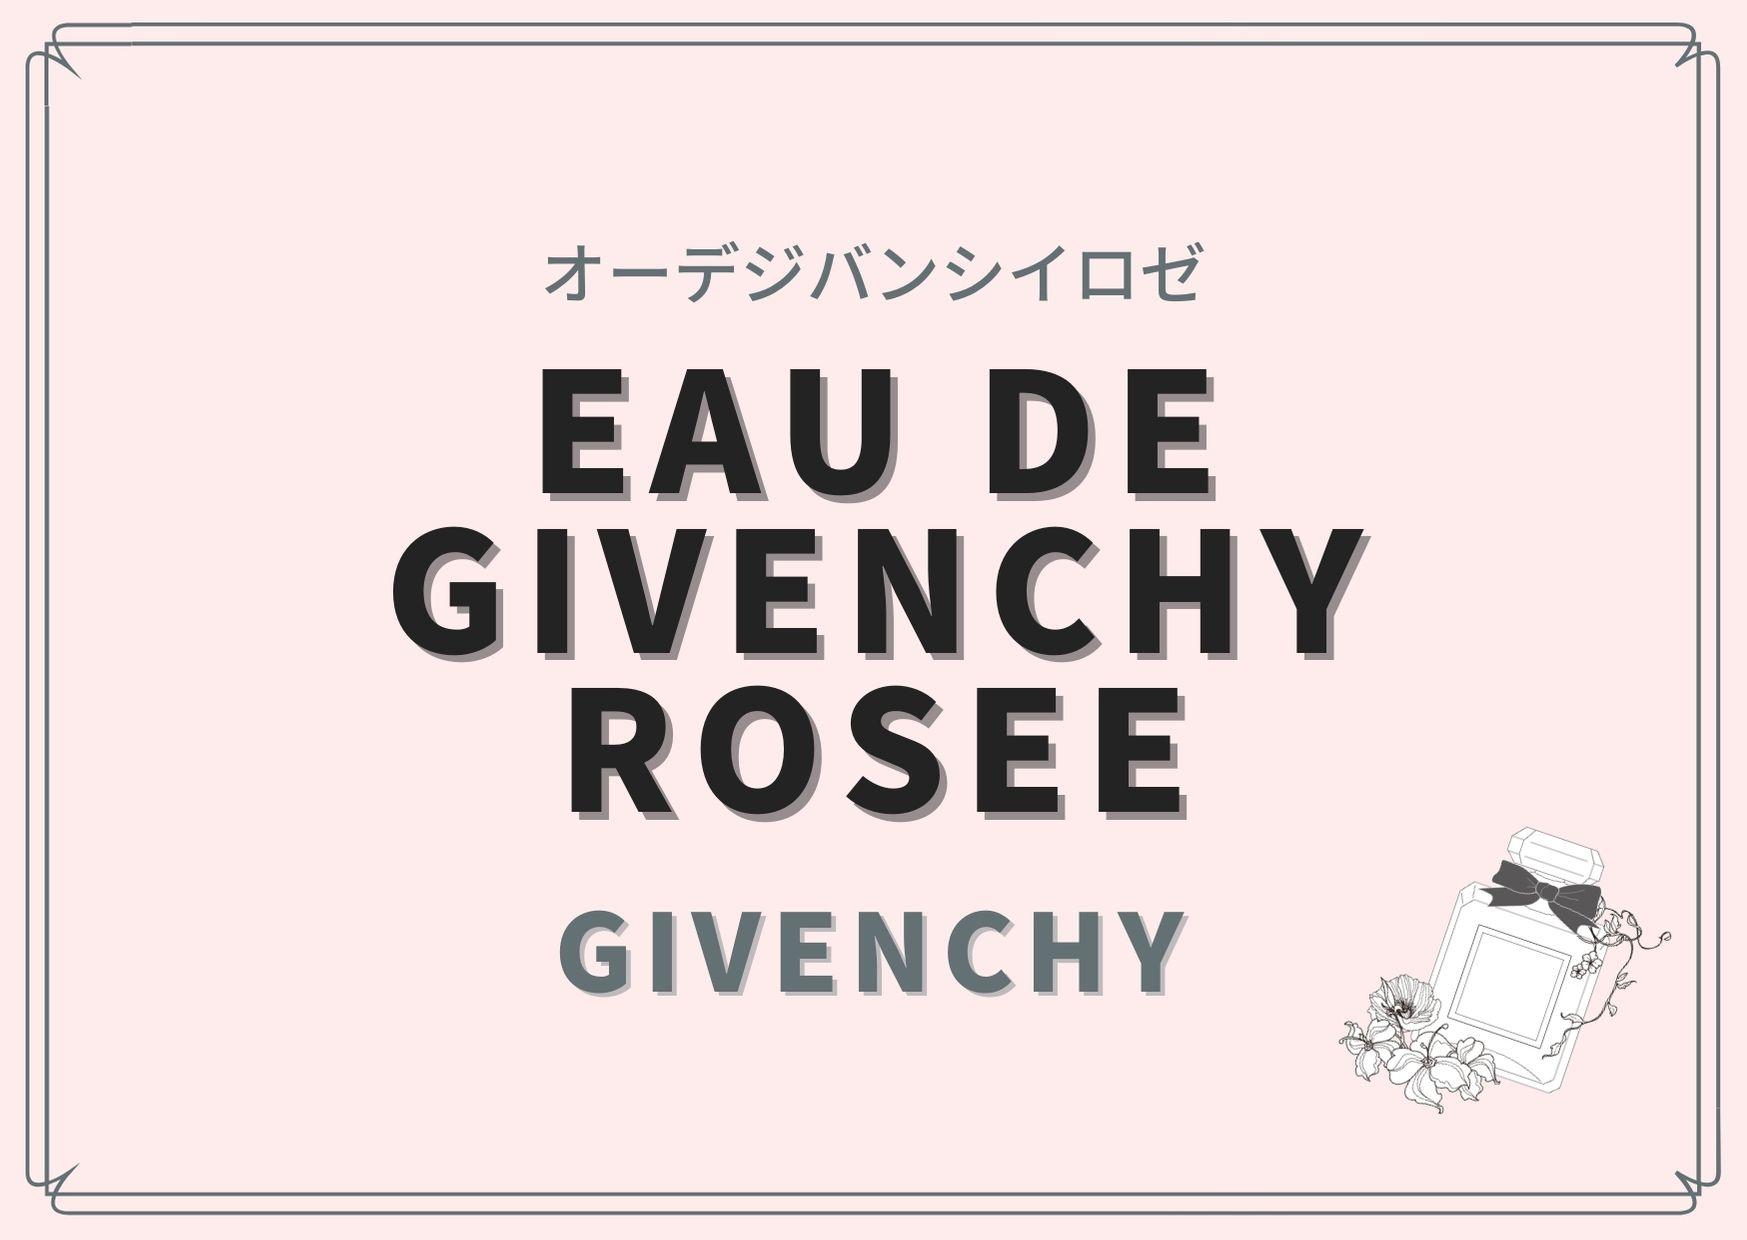 EAU DE GIVENCHY ROSEE(オーデジバンシイロゼ)/GIVENCHY(ジバンシィ)